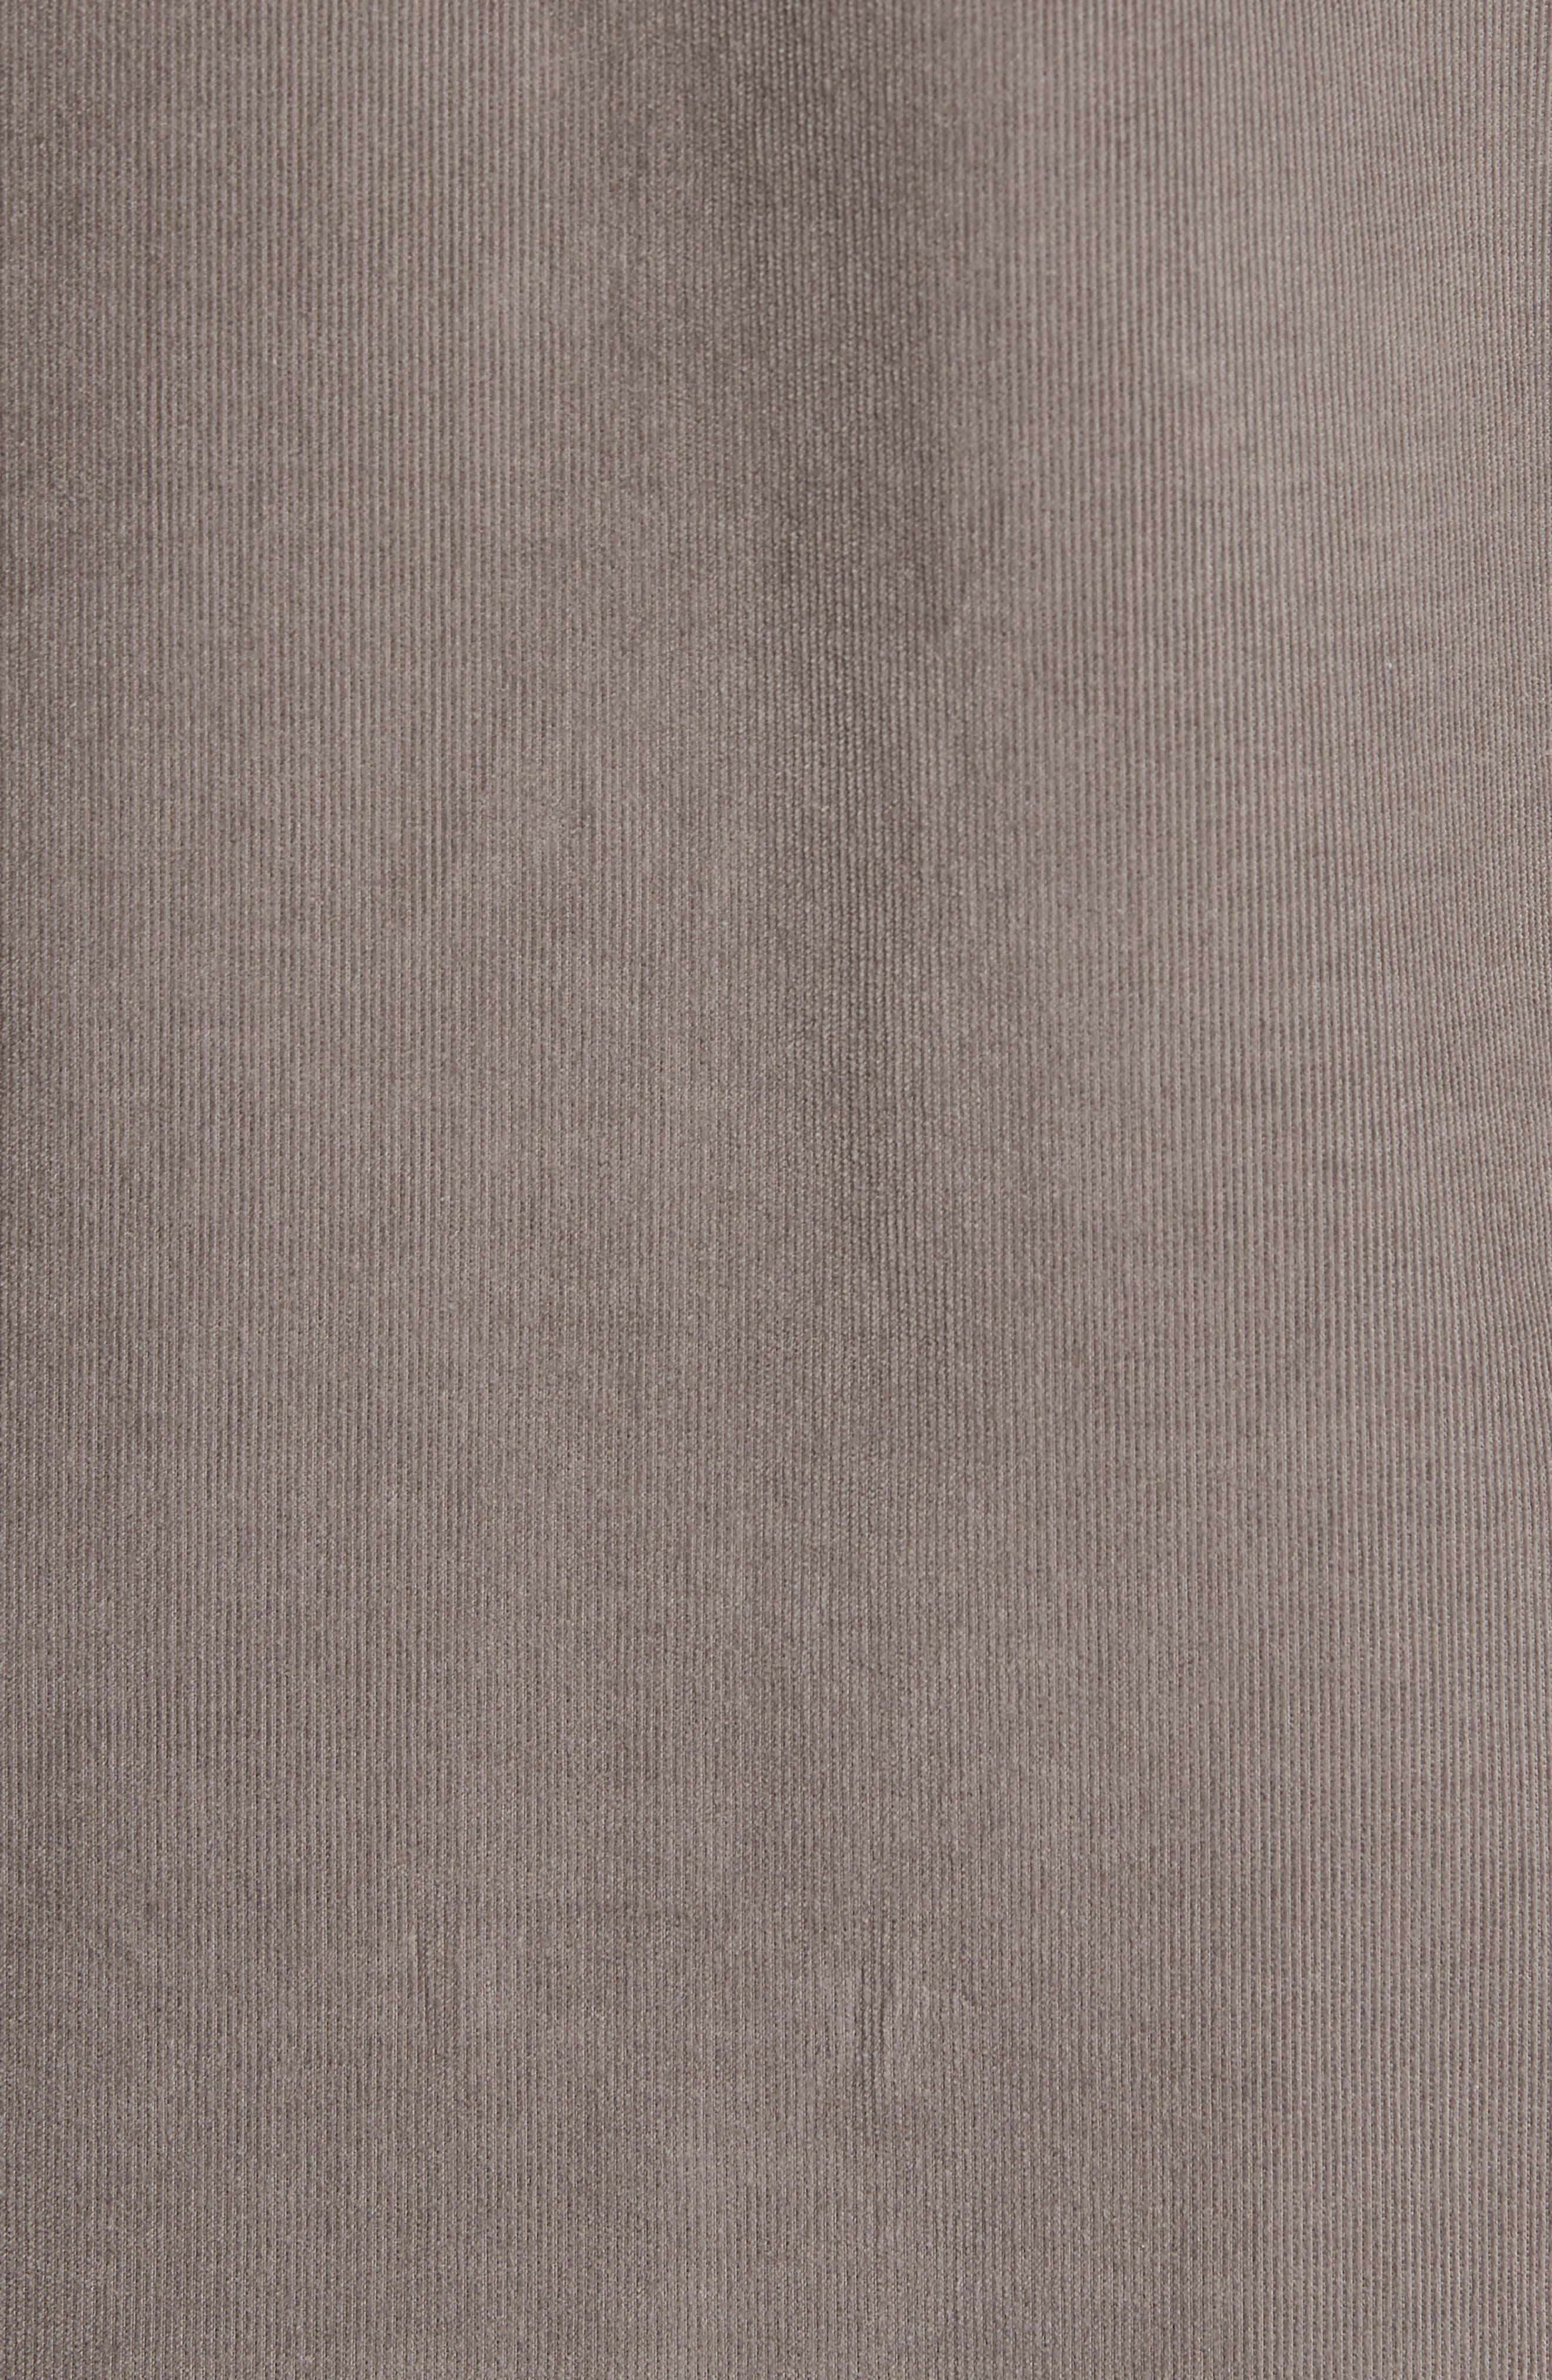 Harrison Cord Standard Fit Shirt,                             Alternate thumbnail 5, color,                             050